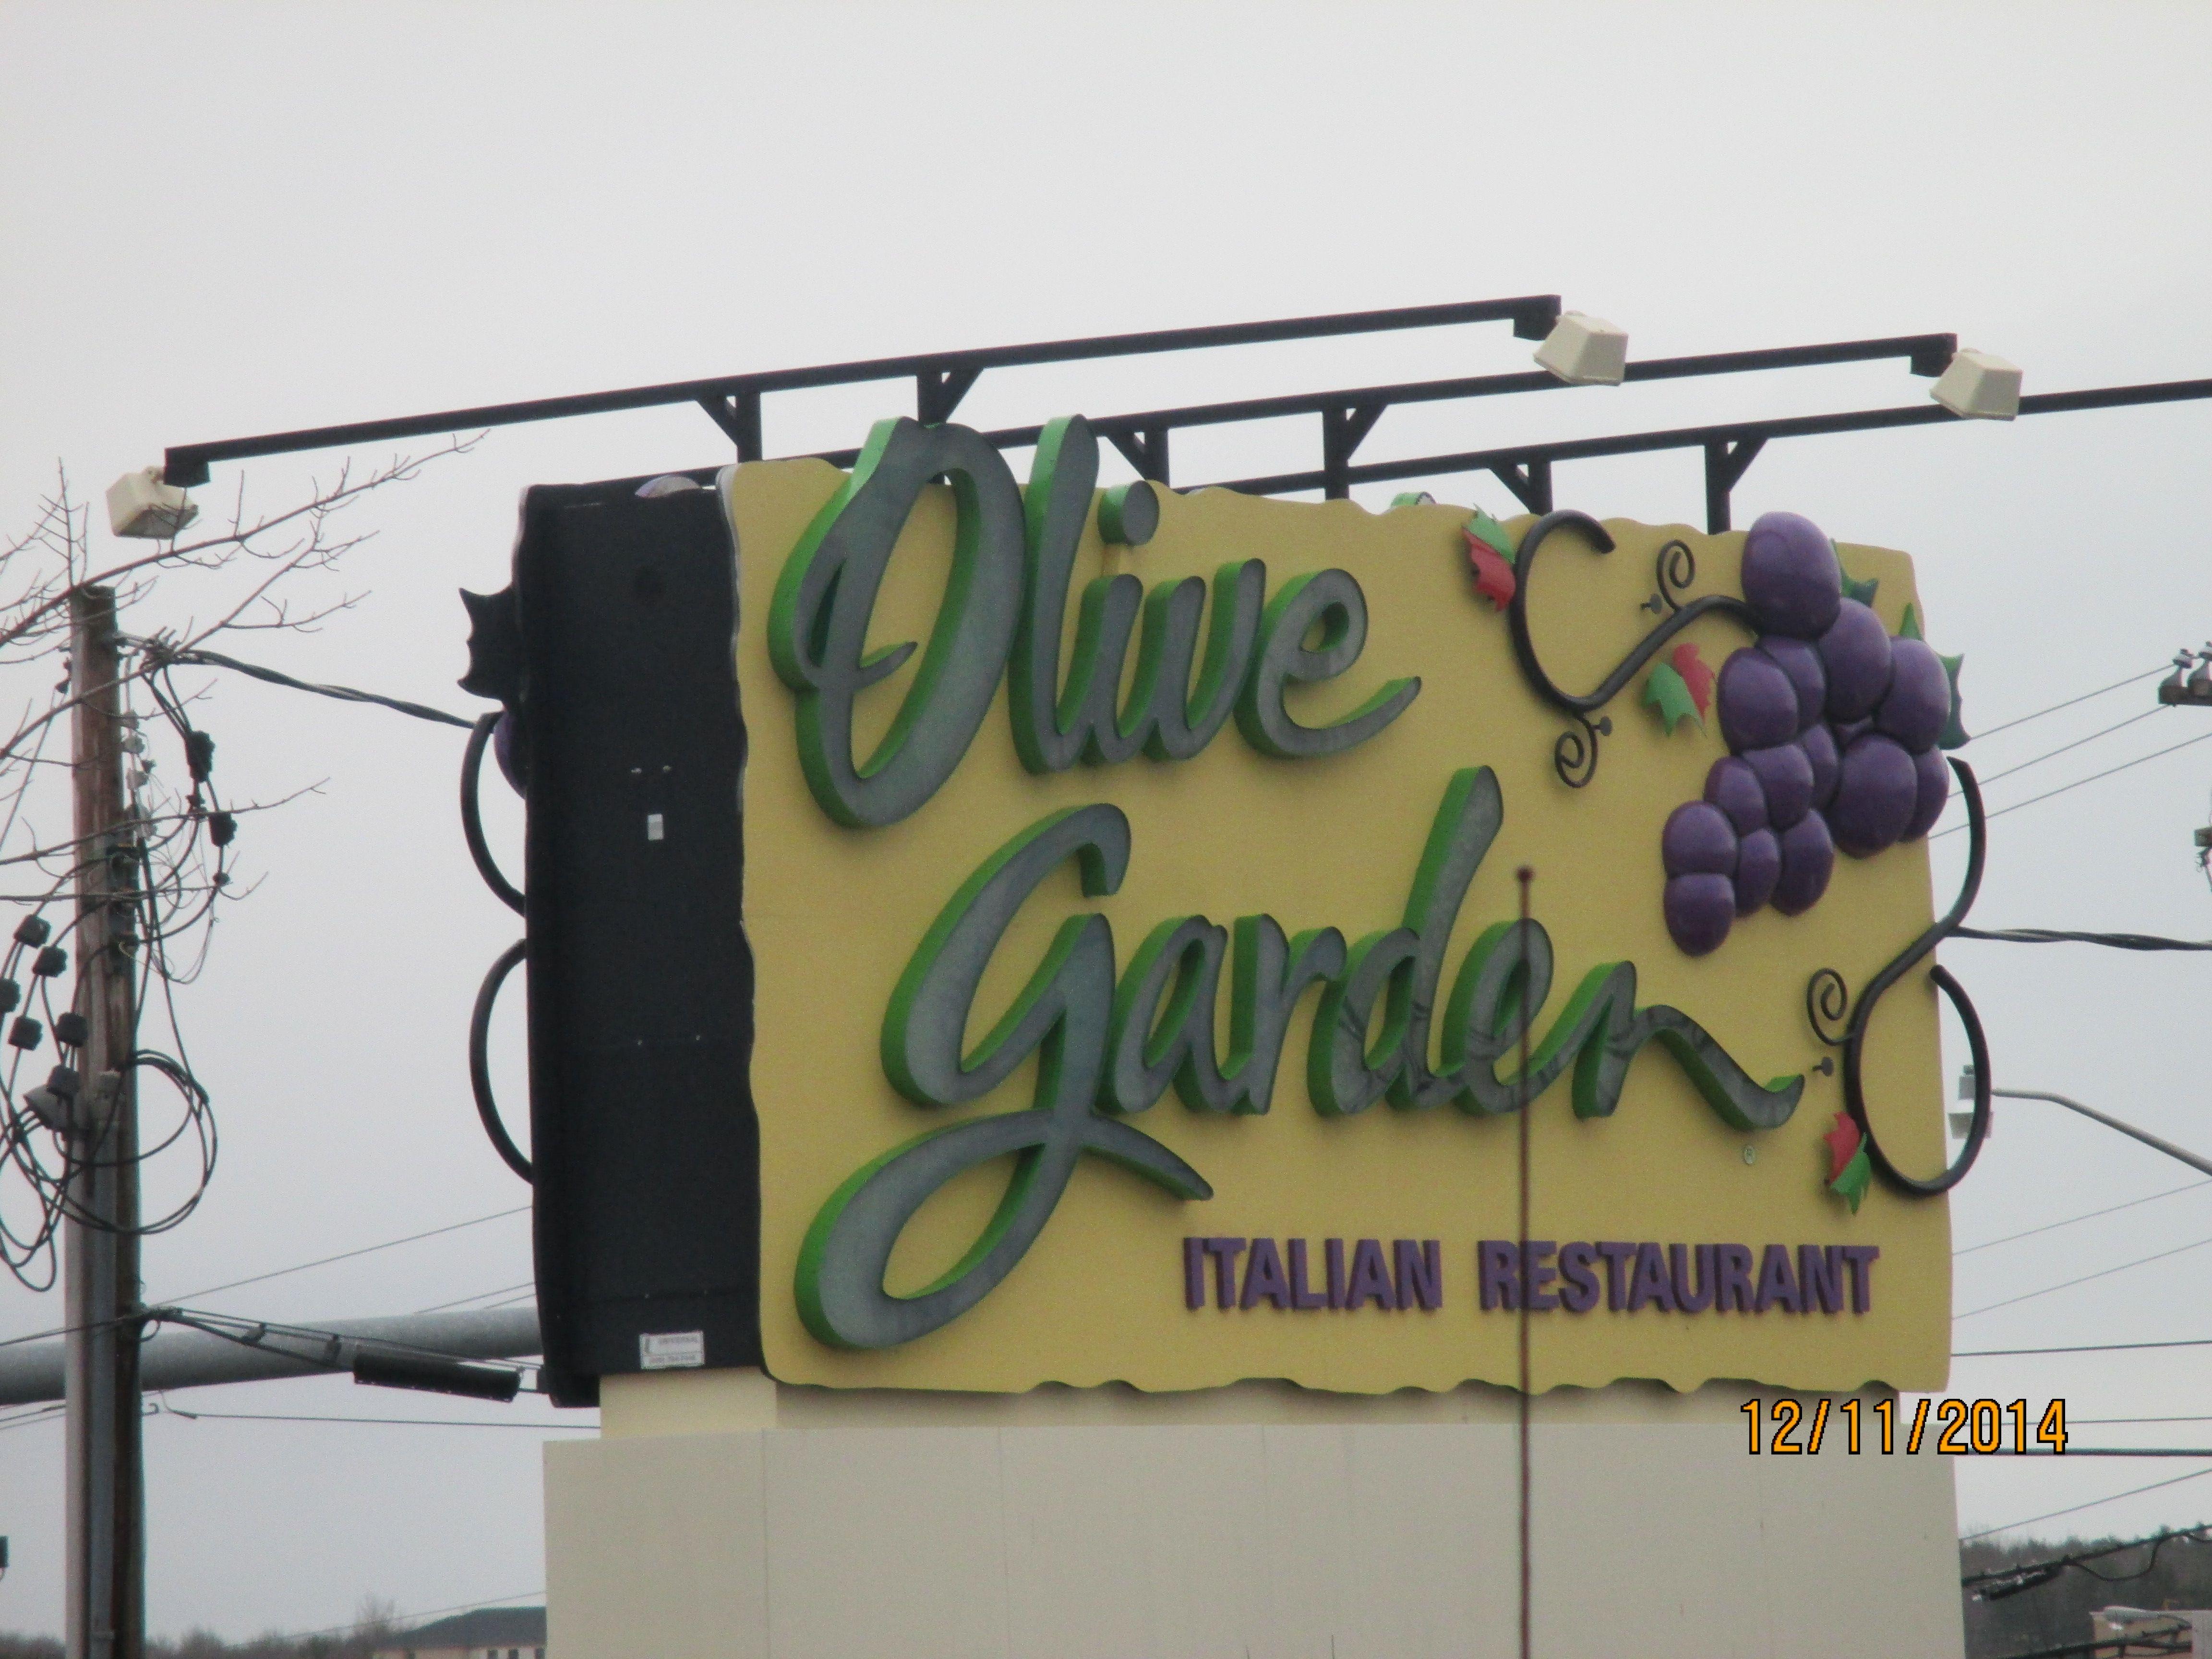 OLIVE GARDEN, HOGAN ROAD Italian restaurant, Neon signs